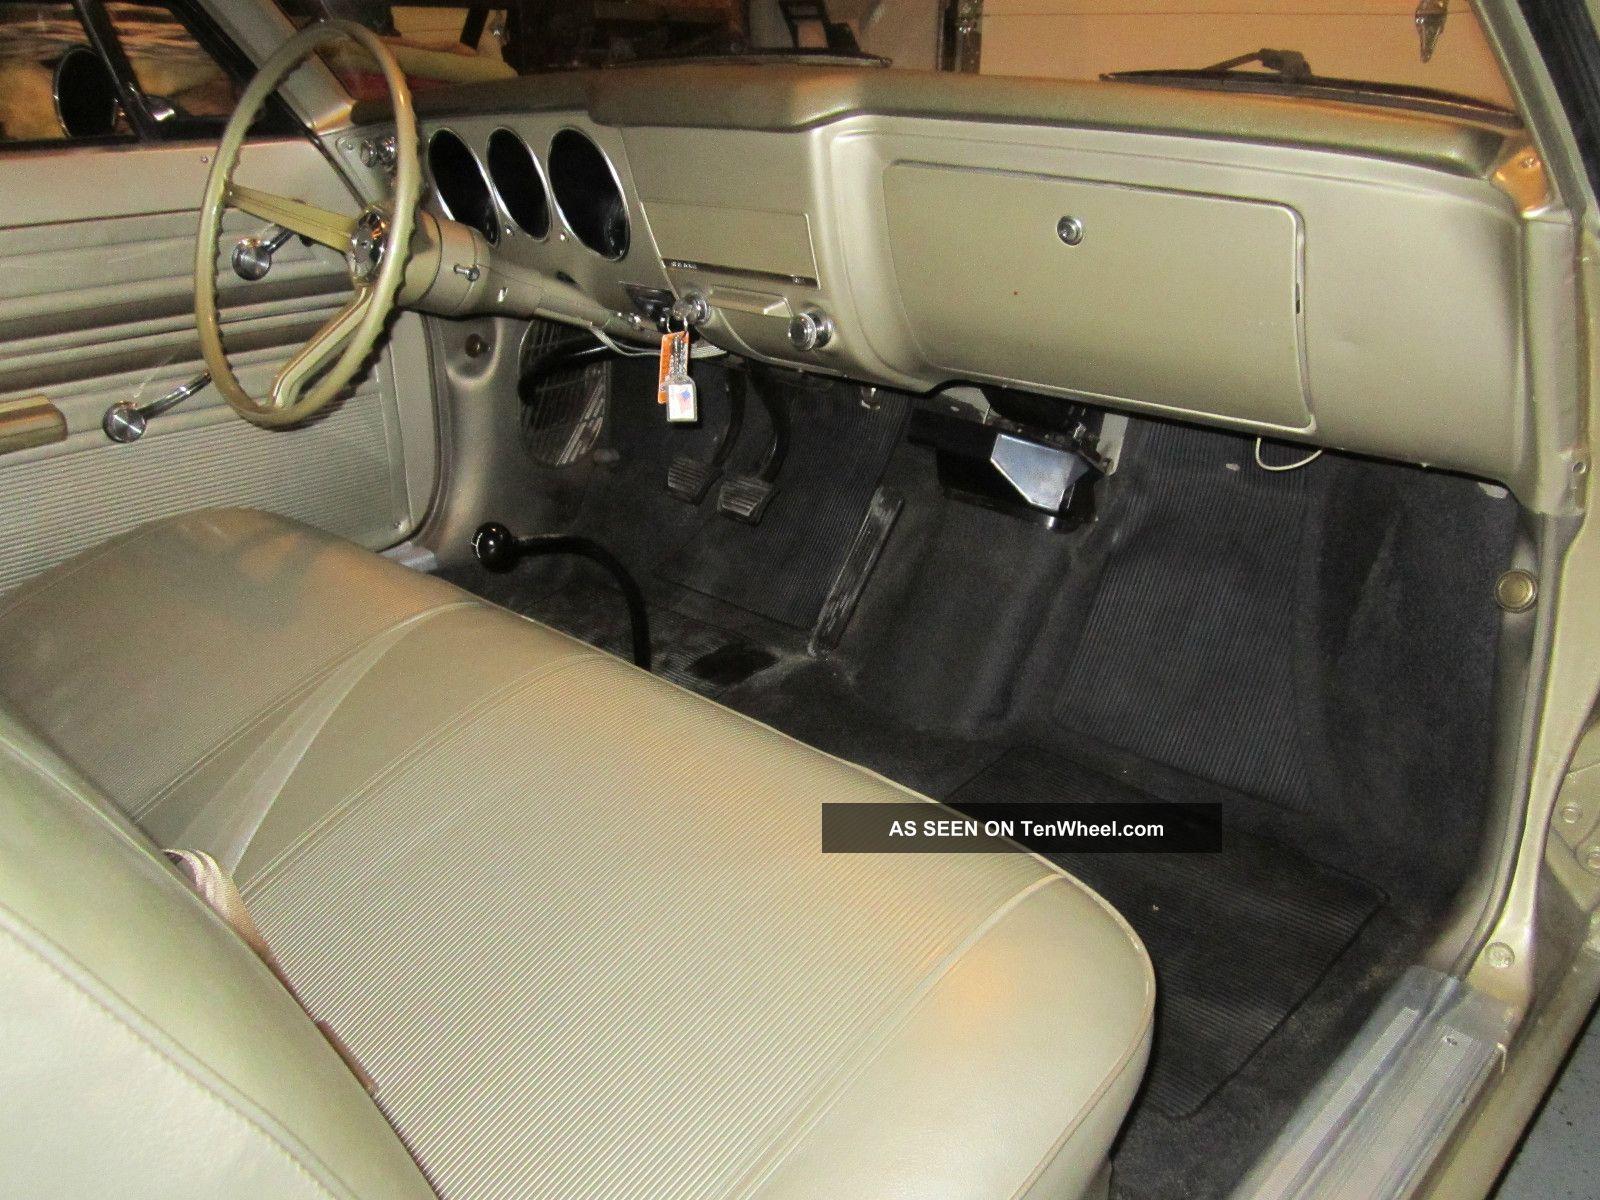 1967 Ford Galaxie 500 Owners Manual 390 Wiring Diagram 2 Door Hardtop Thunderbird